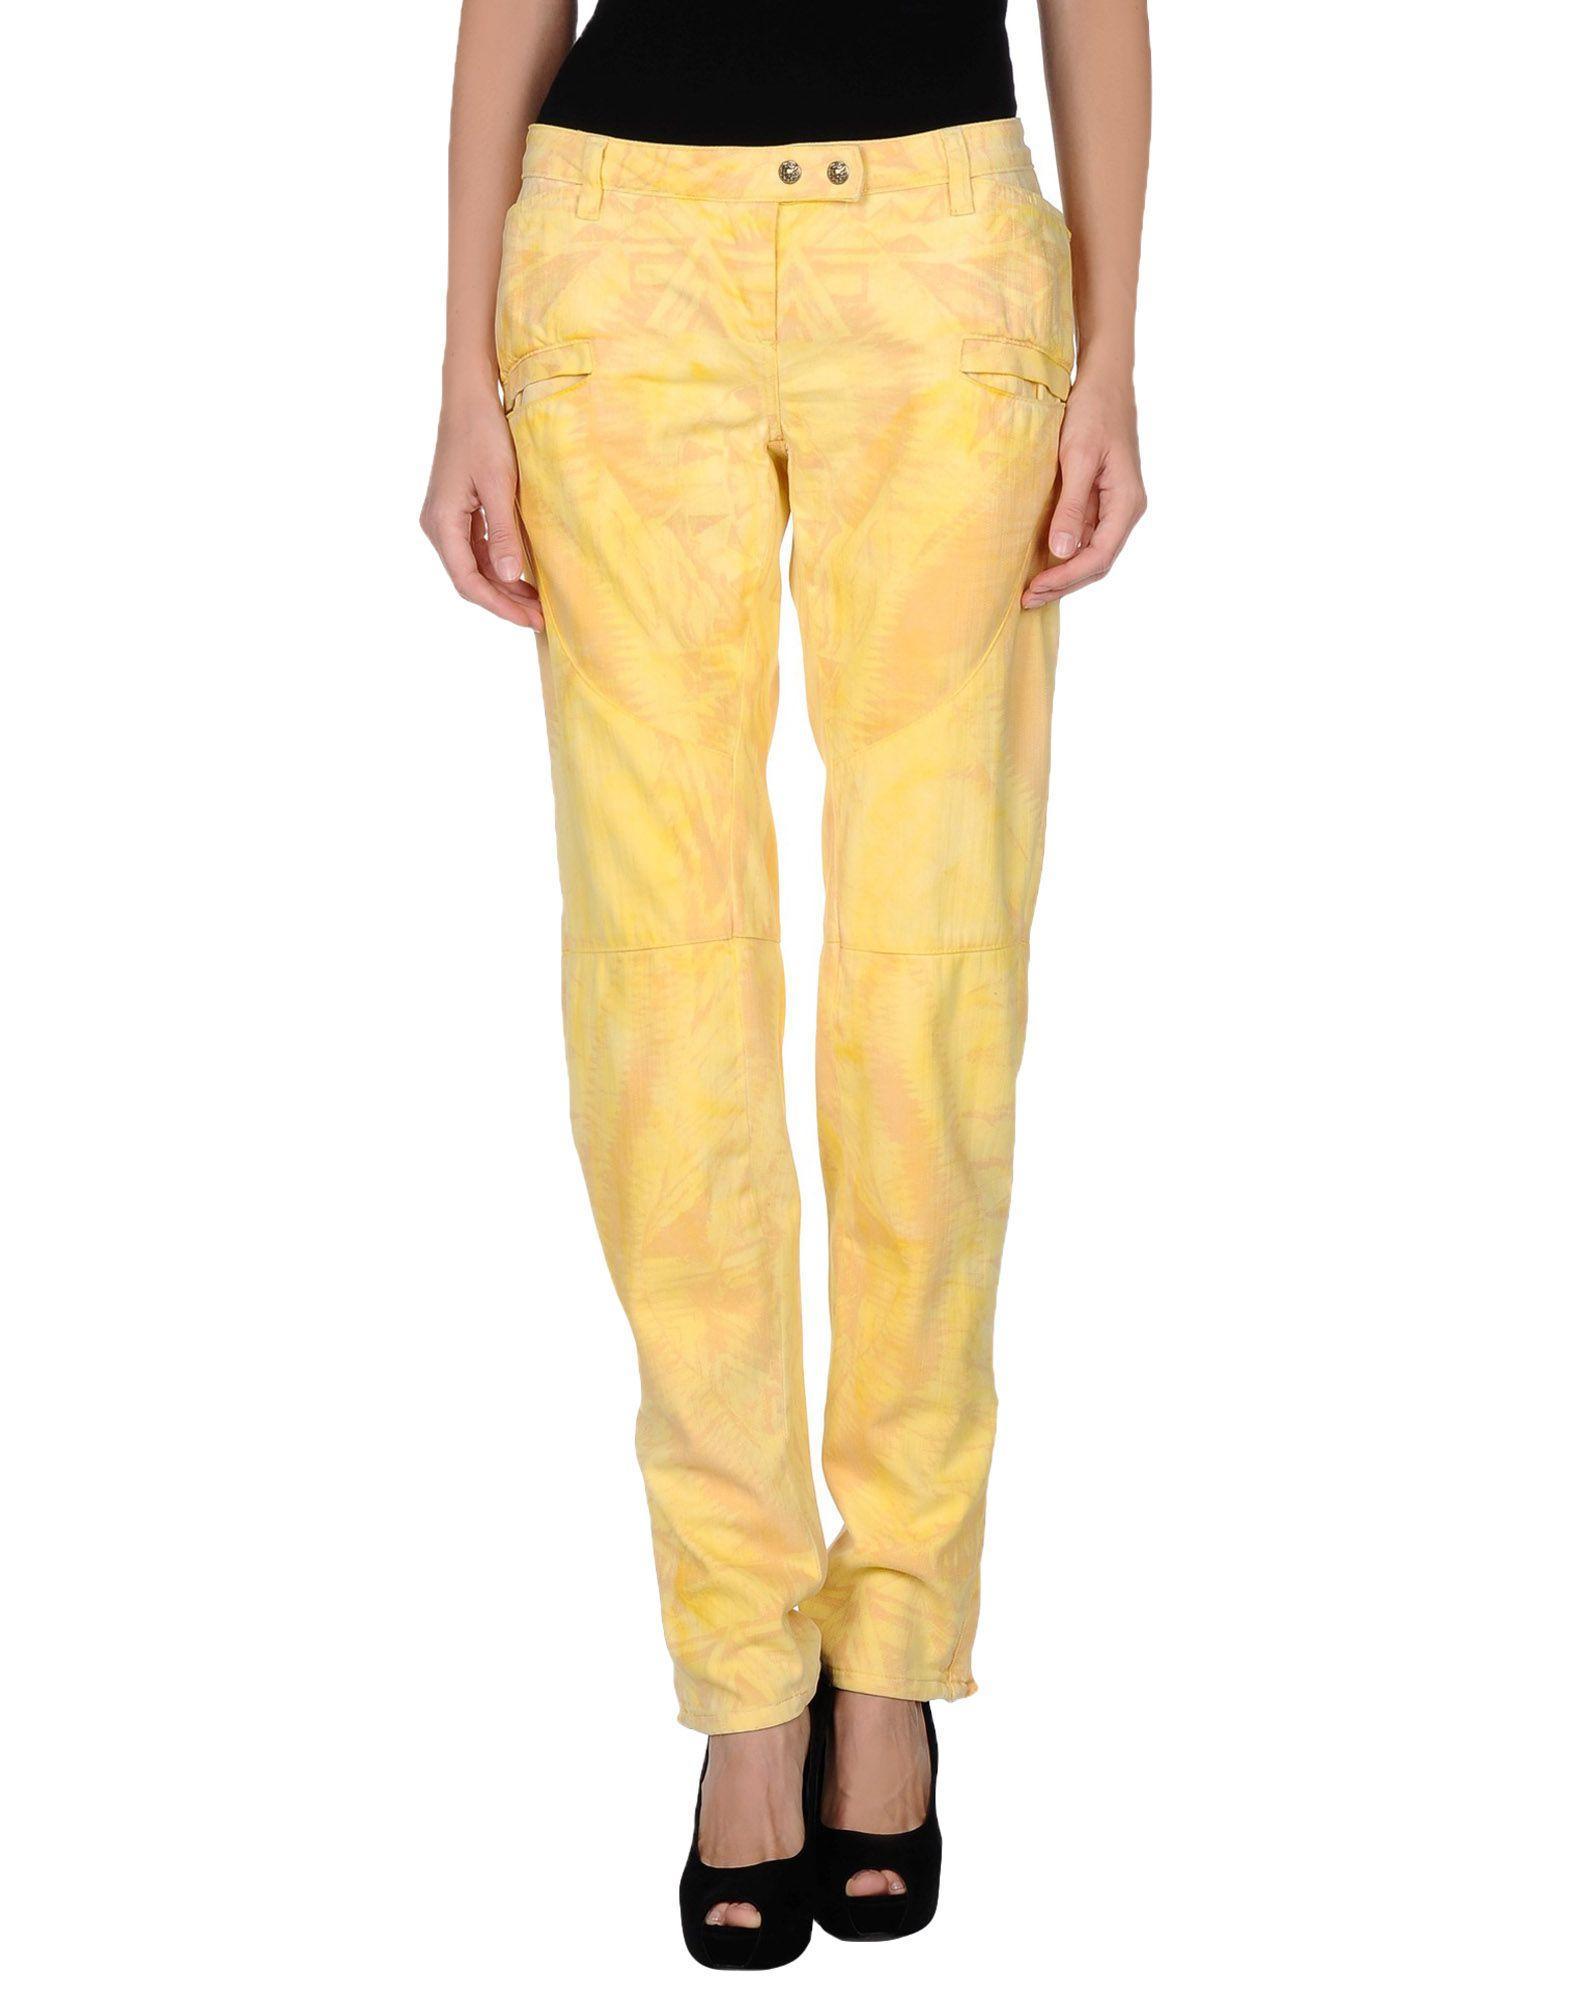 269146d6 Balmain Denim Pants In Yellow | ModeSens